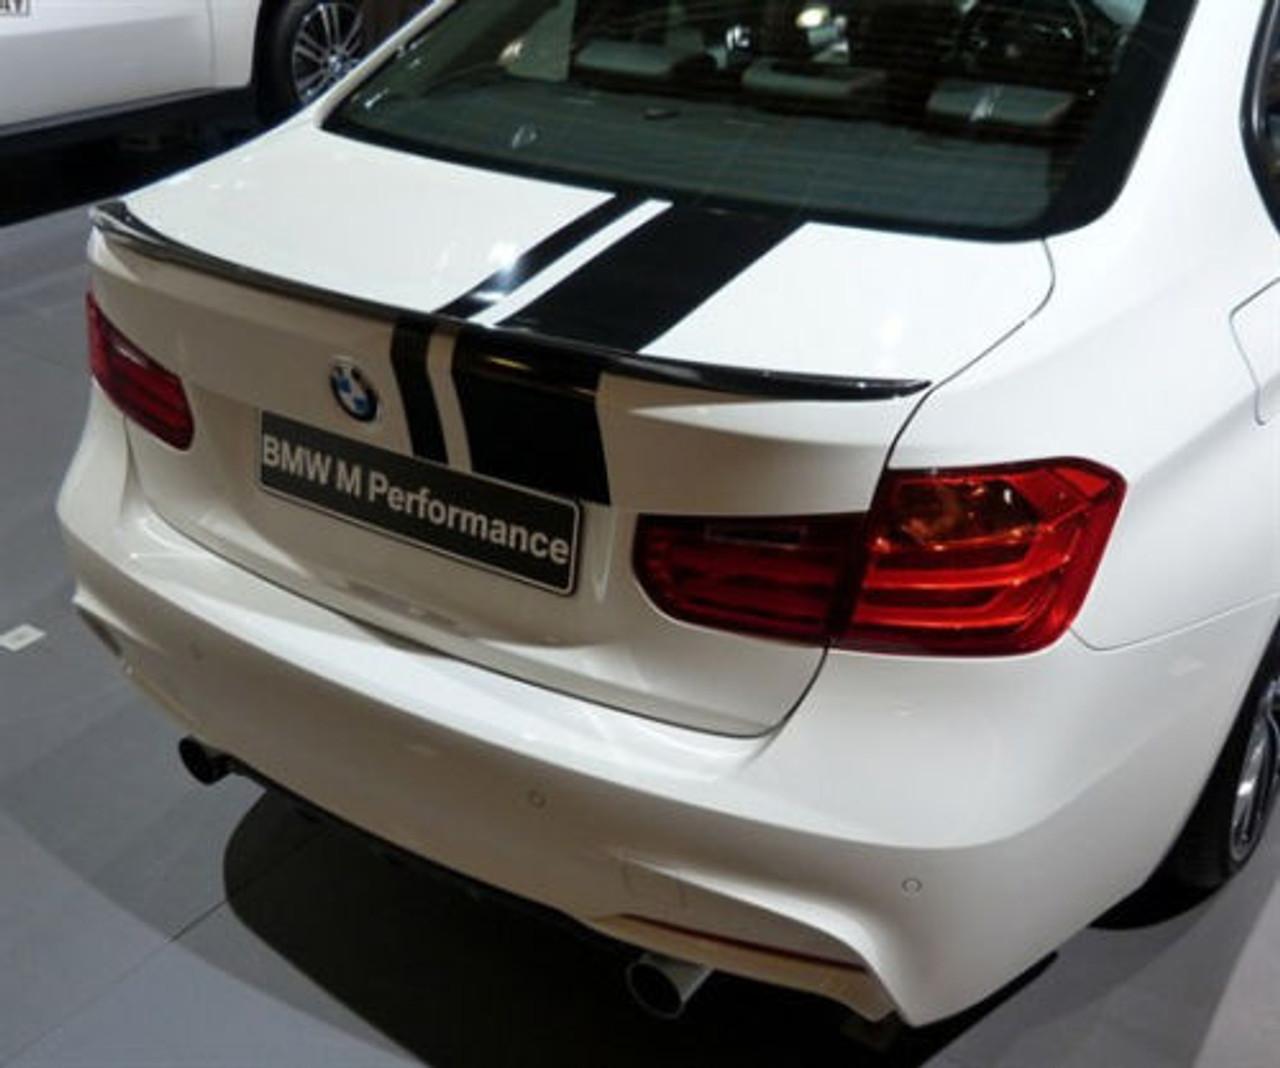 BMW M Performance Rear Deck Spoiler for F30 Sedan & F80 M3